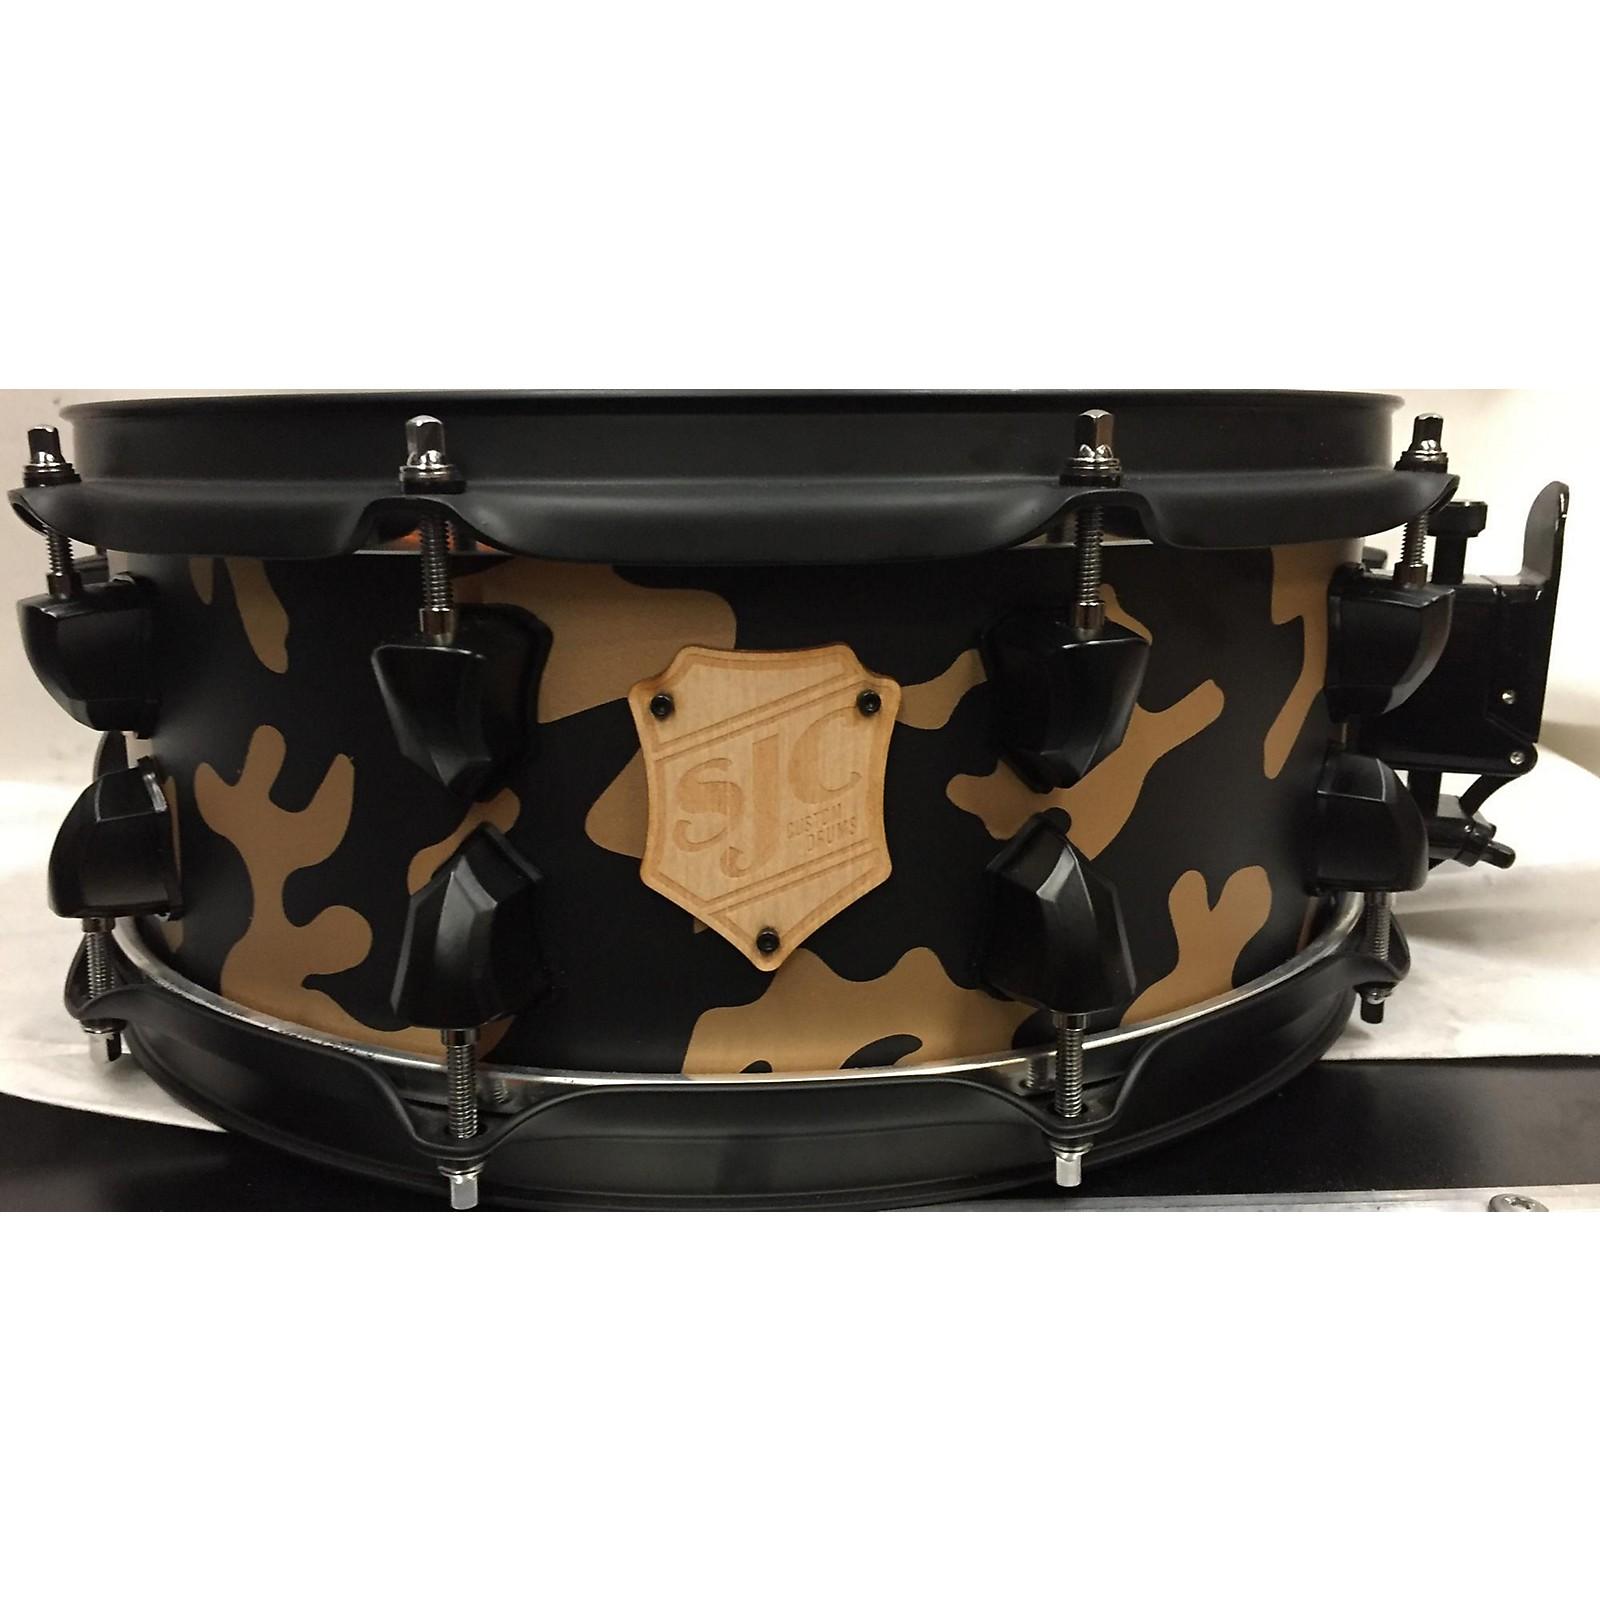 SJC Drums 6.5X14 Custom Snare Drum